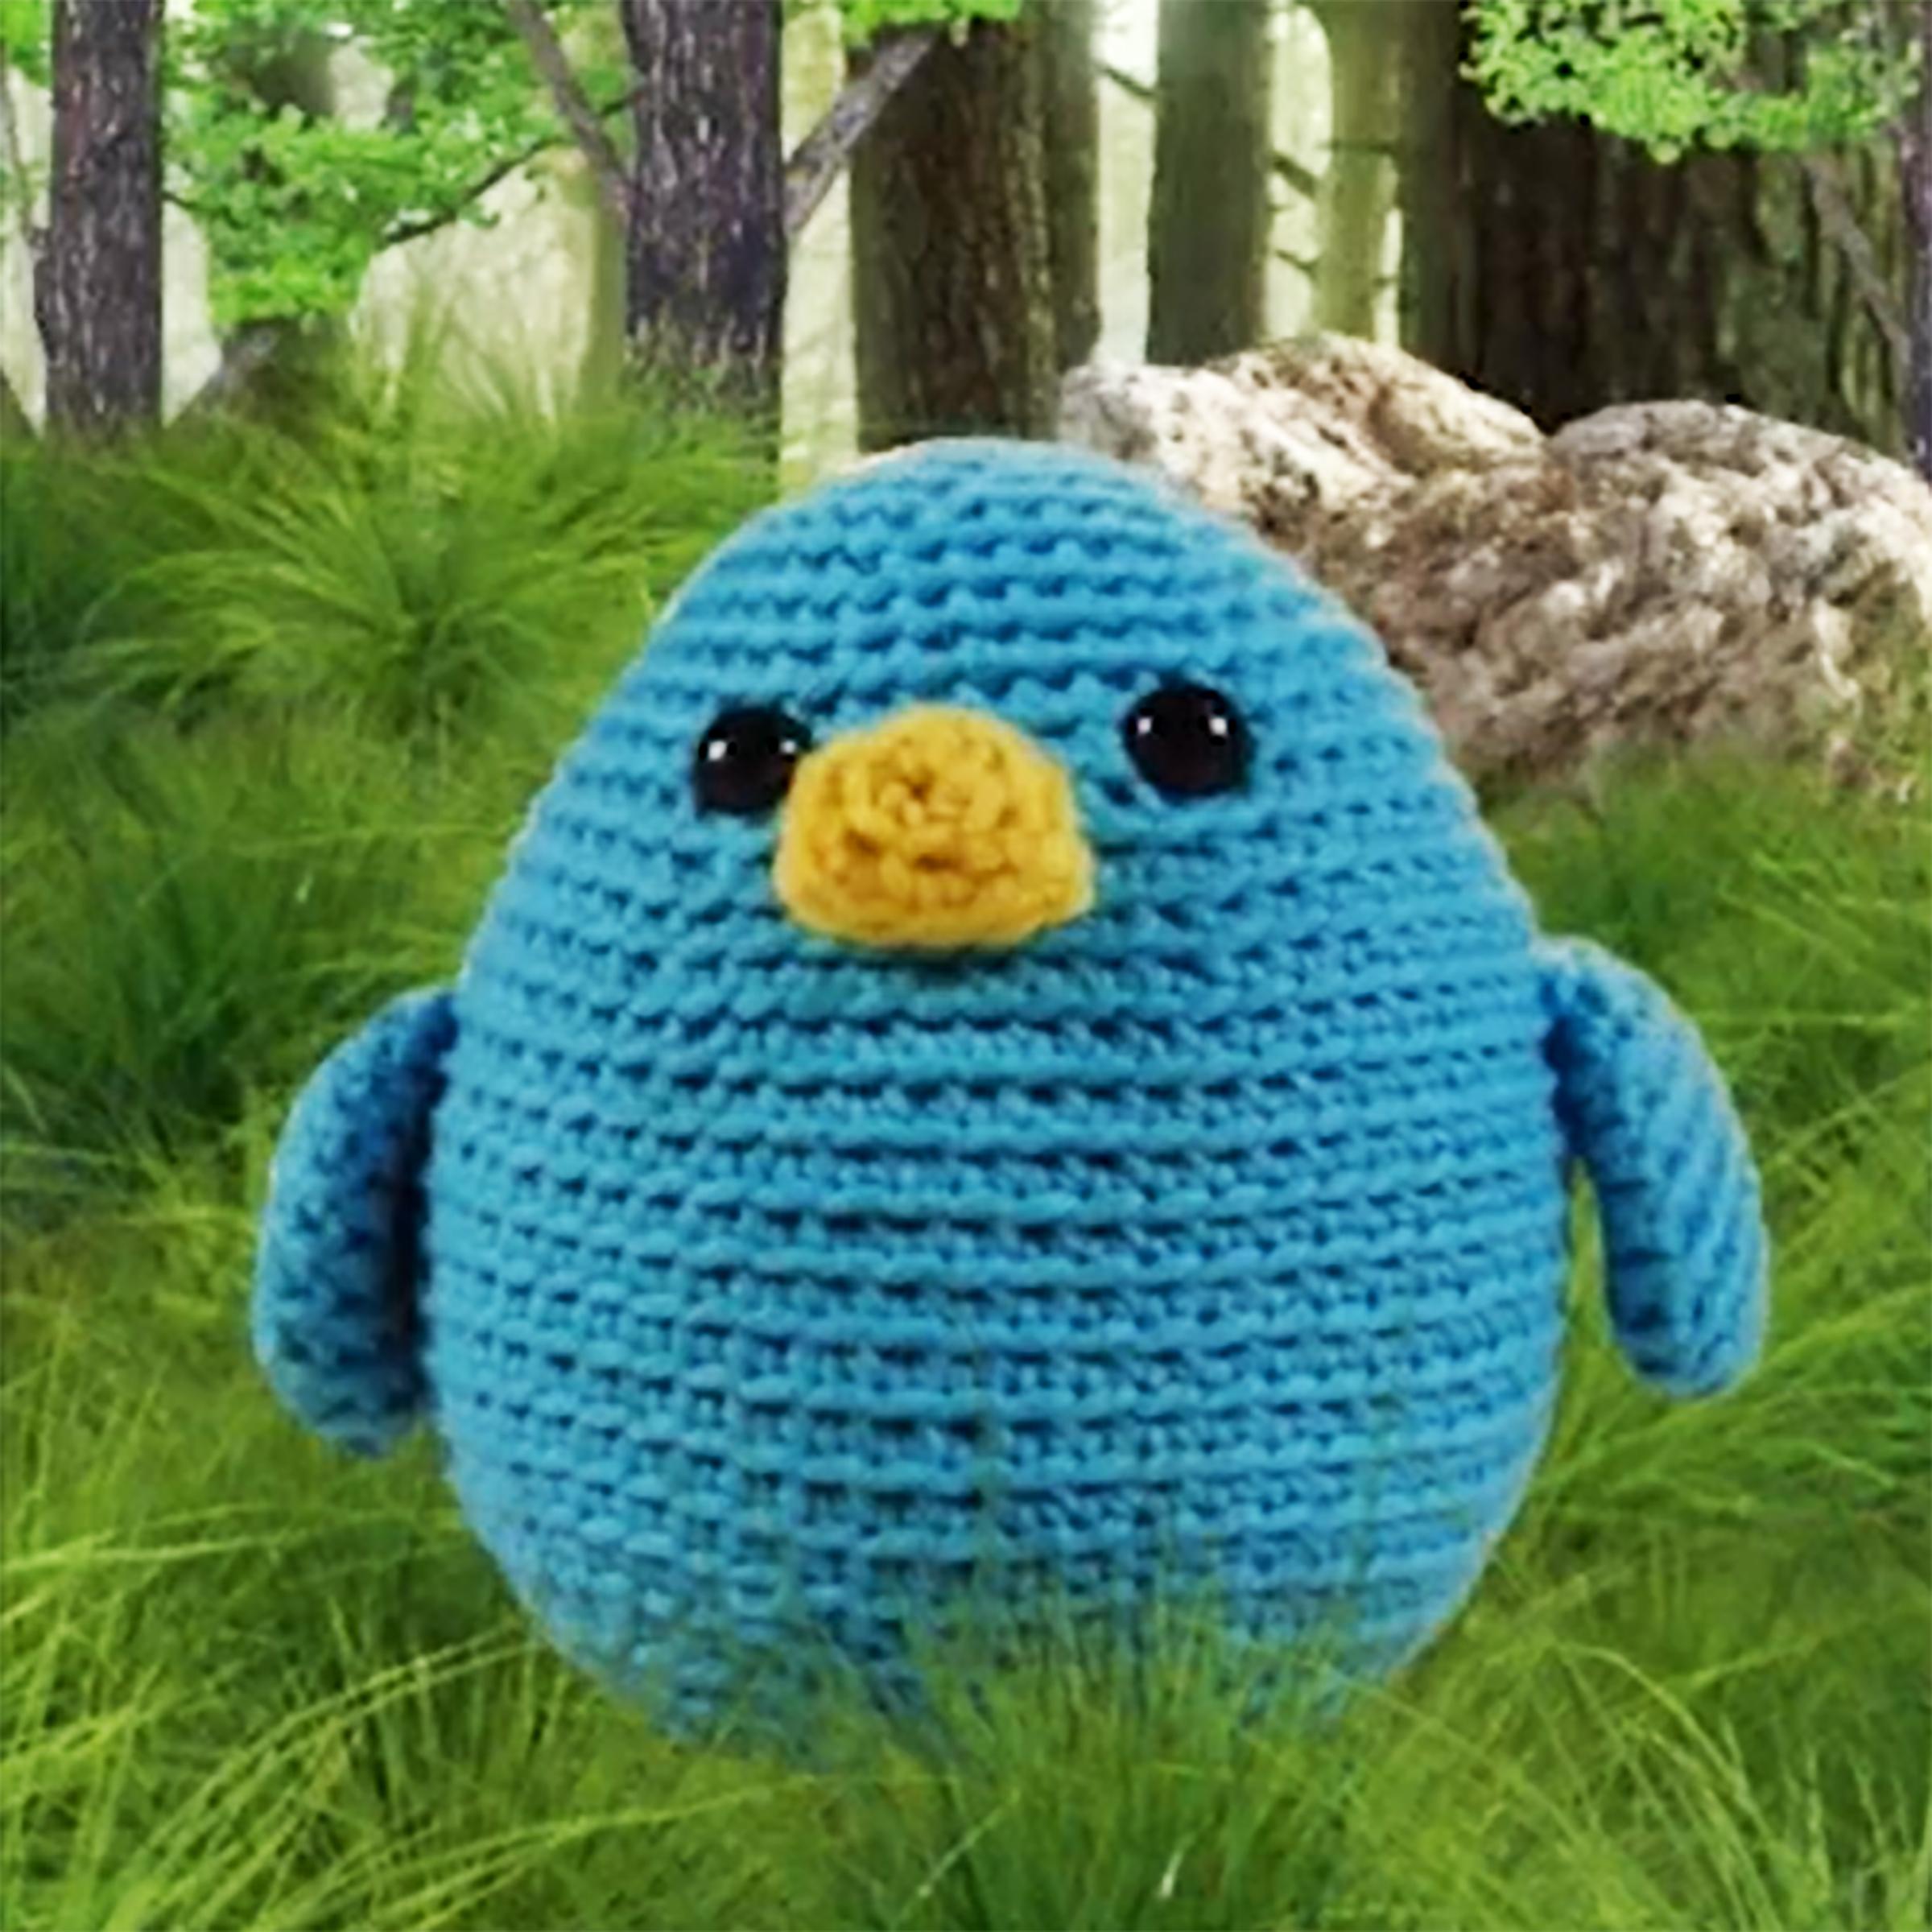 small blue crocheted bird with yellow beak